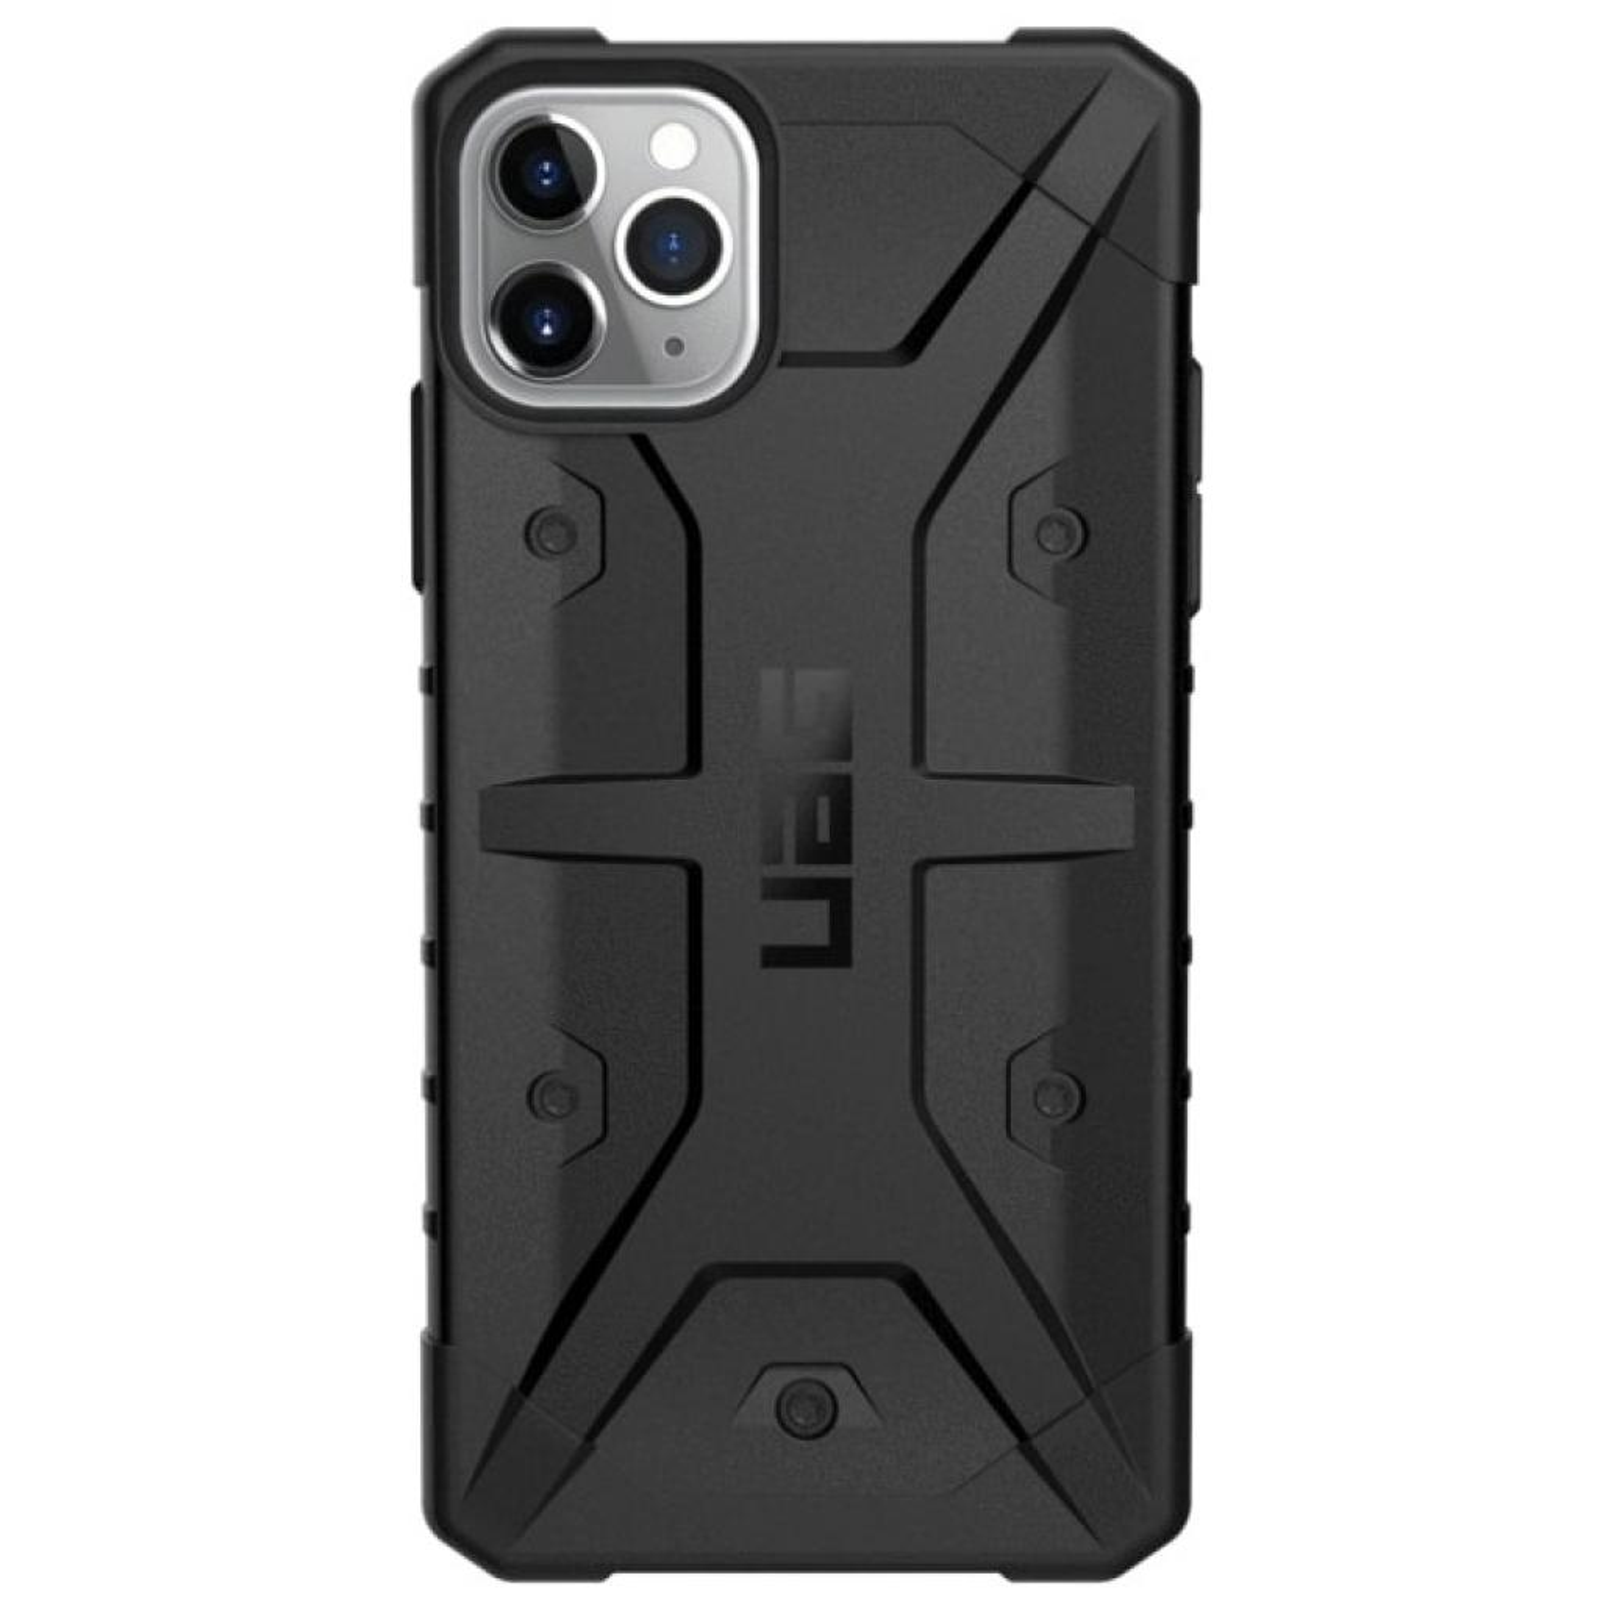 Чехол для моб. телефона Uag iPhone 11 Pro Max Pathfinder, Slate (111727115454)